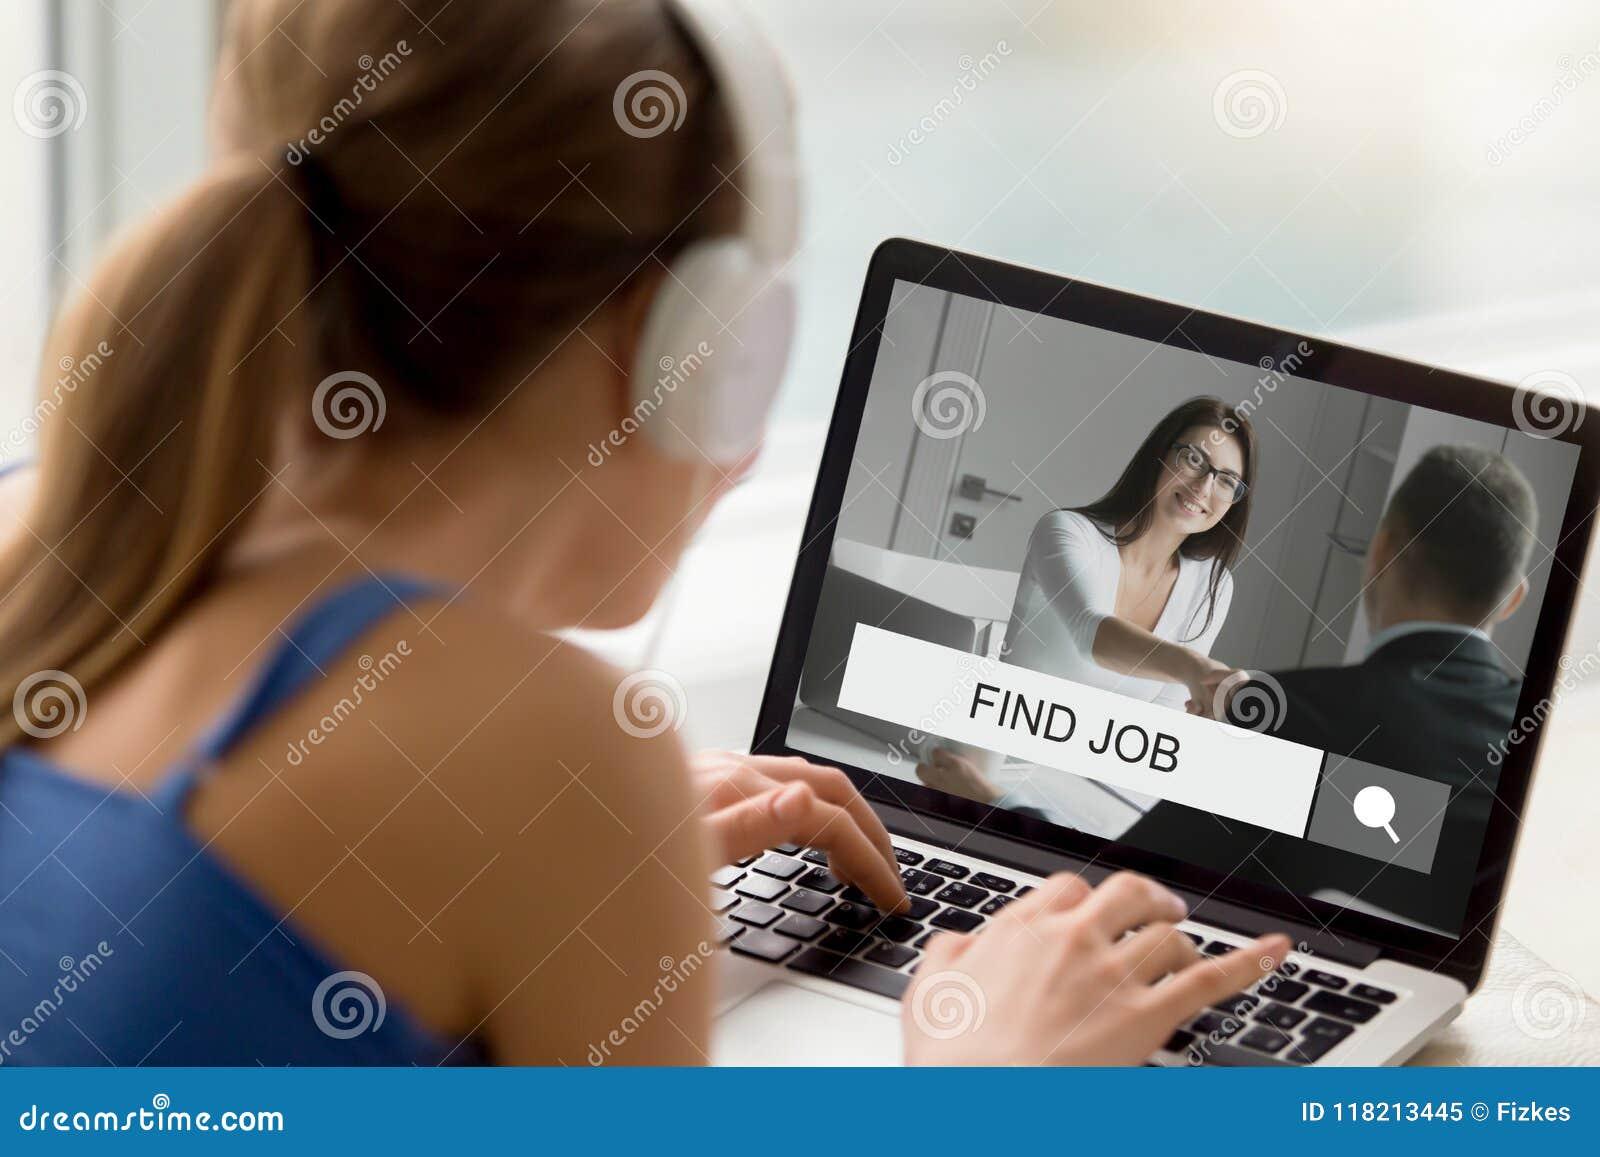 Find a lady online